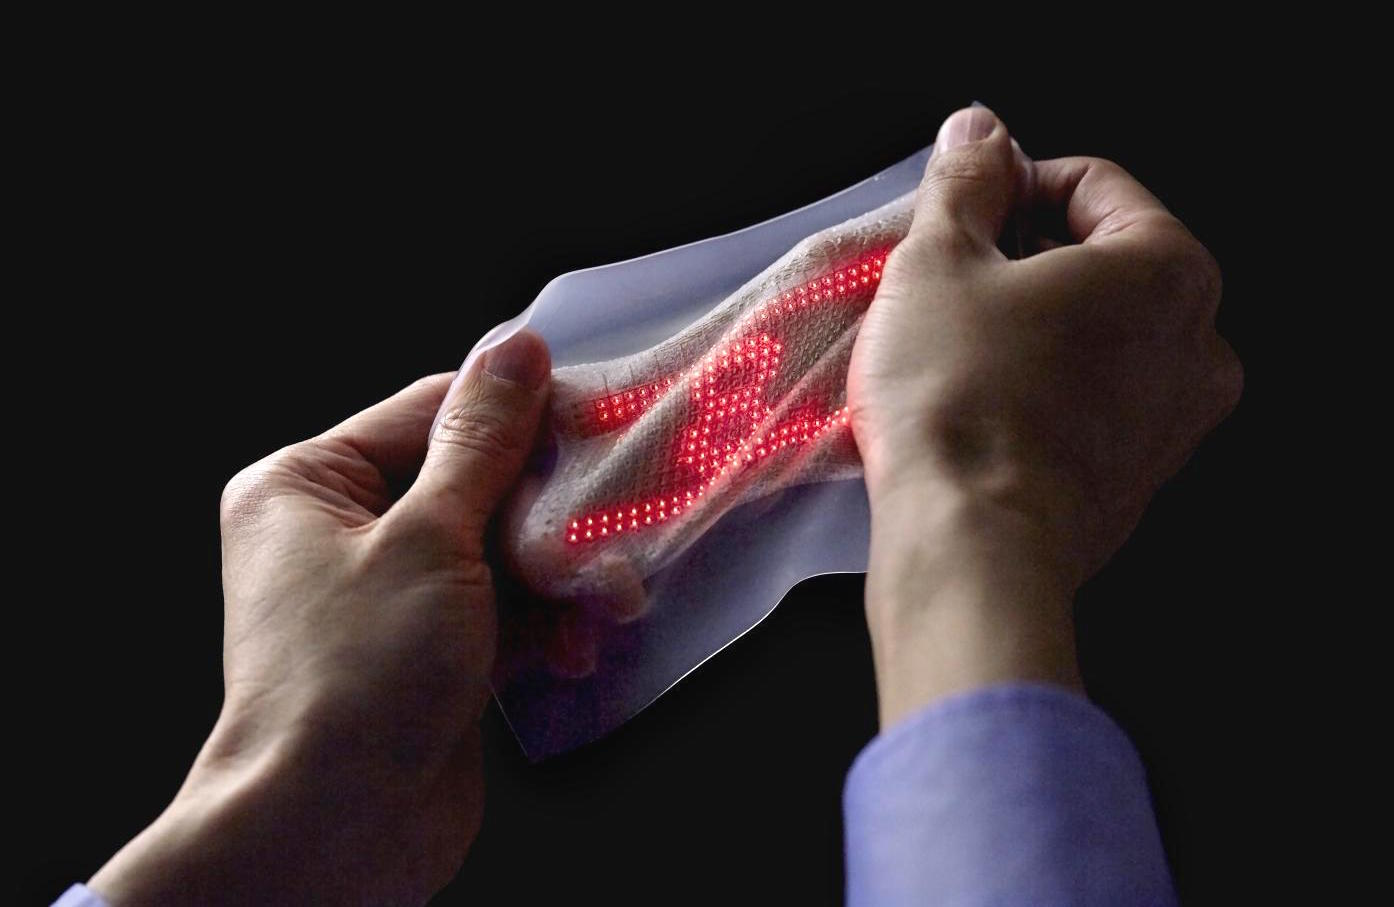 Electronic skin animates heartbeat (Watch)